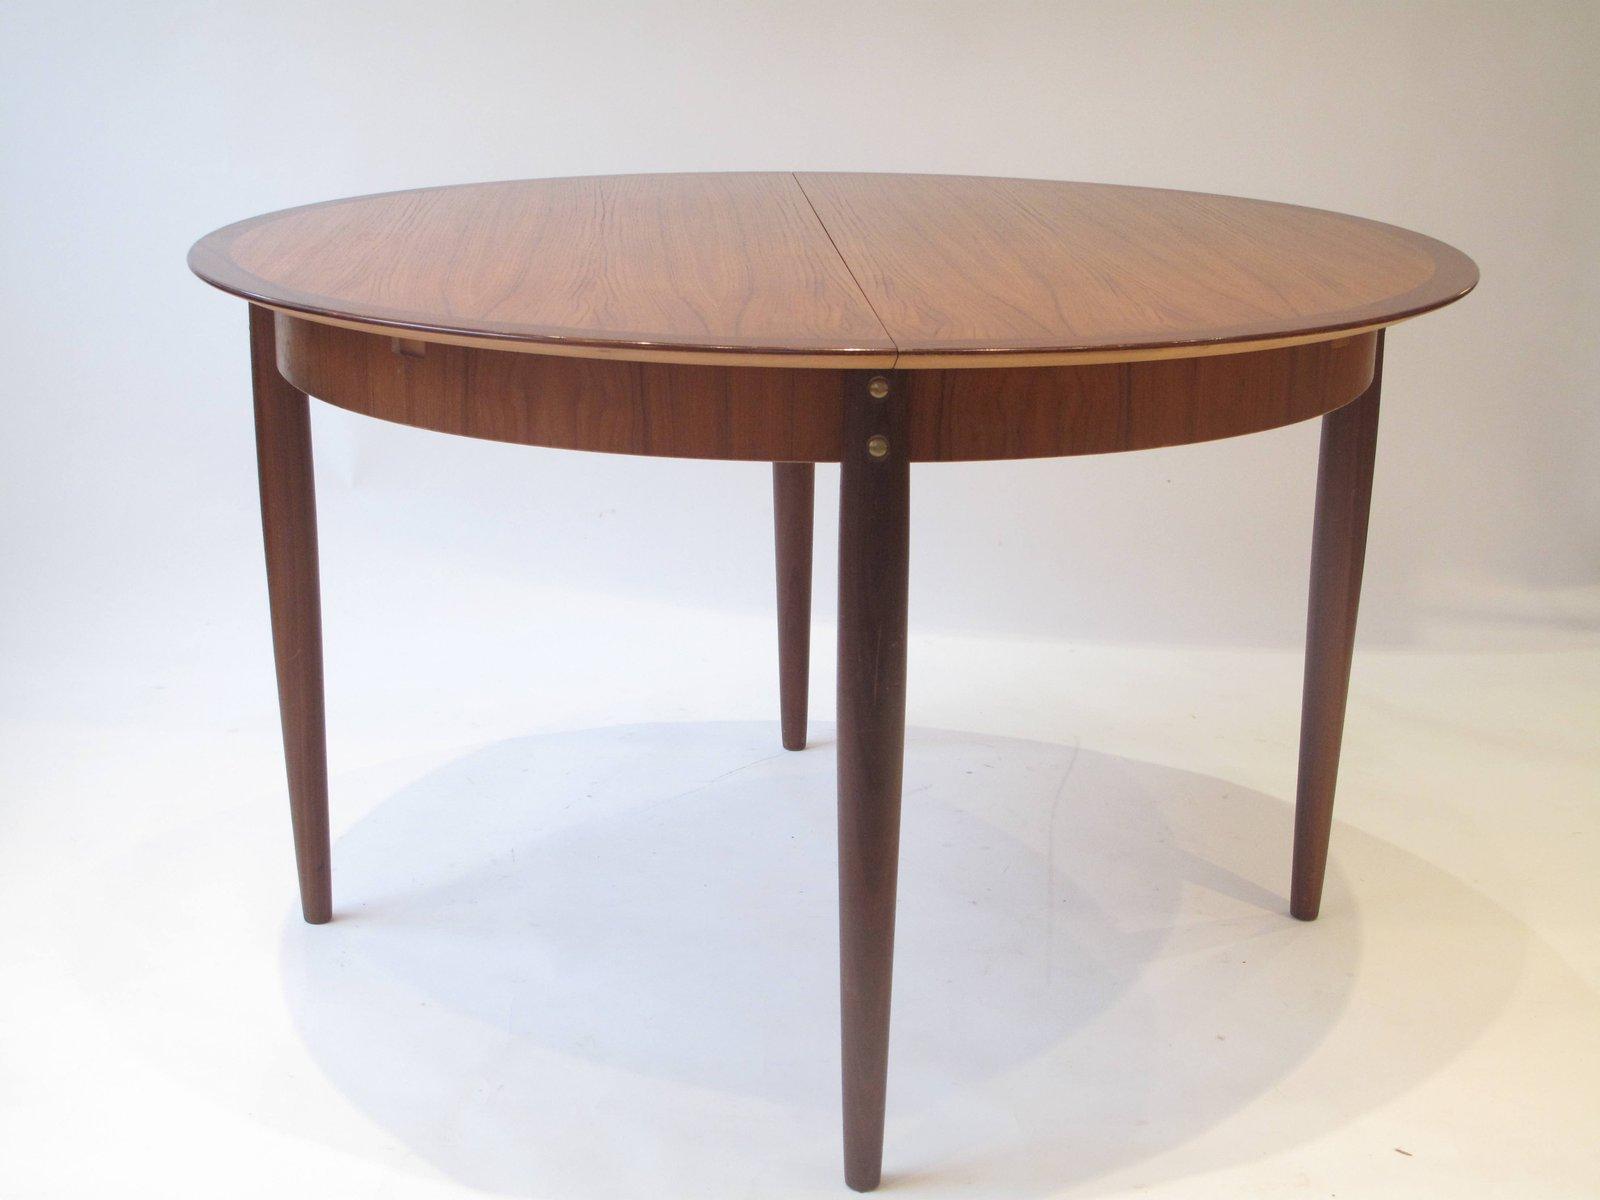 table de salle manger mid century ronde france 1960s en vente sur pamono. Black Bedroom Furniture Sets. Home Design Ideas